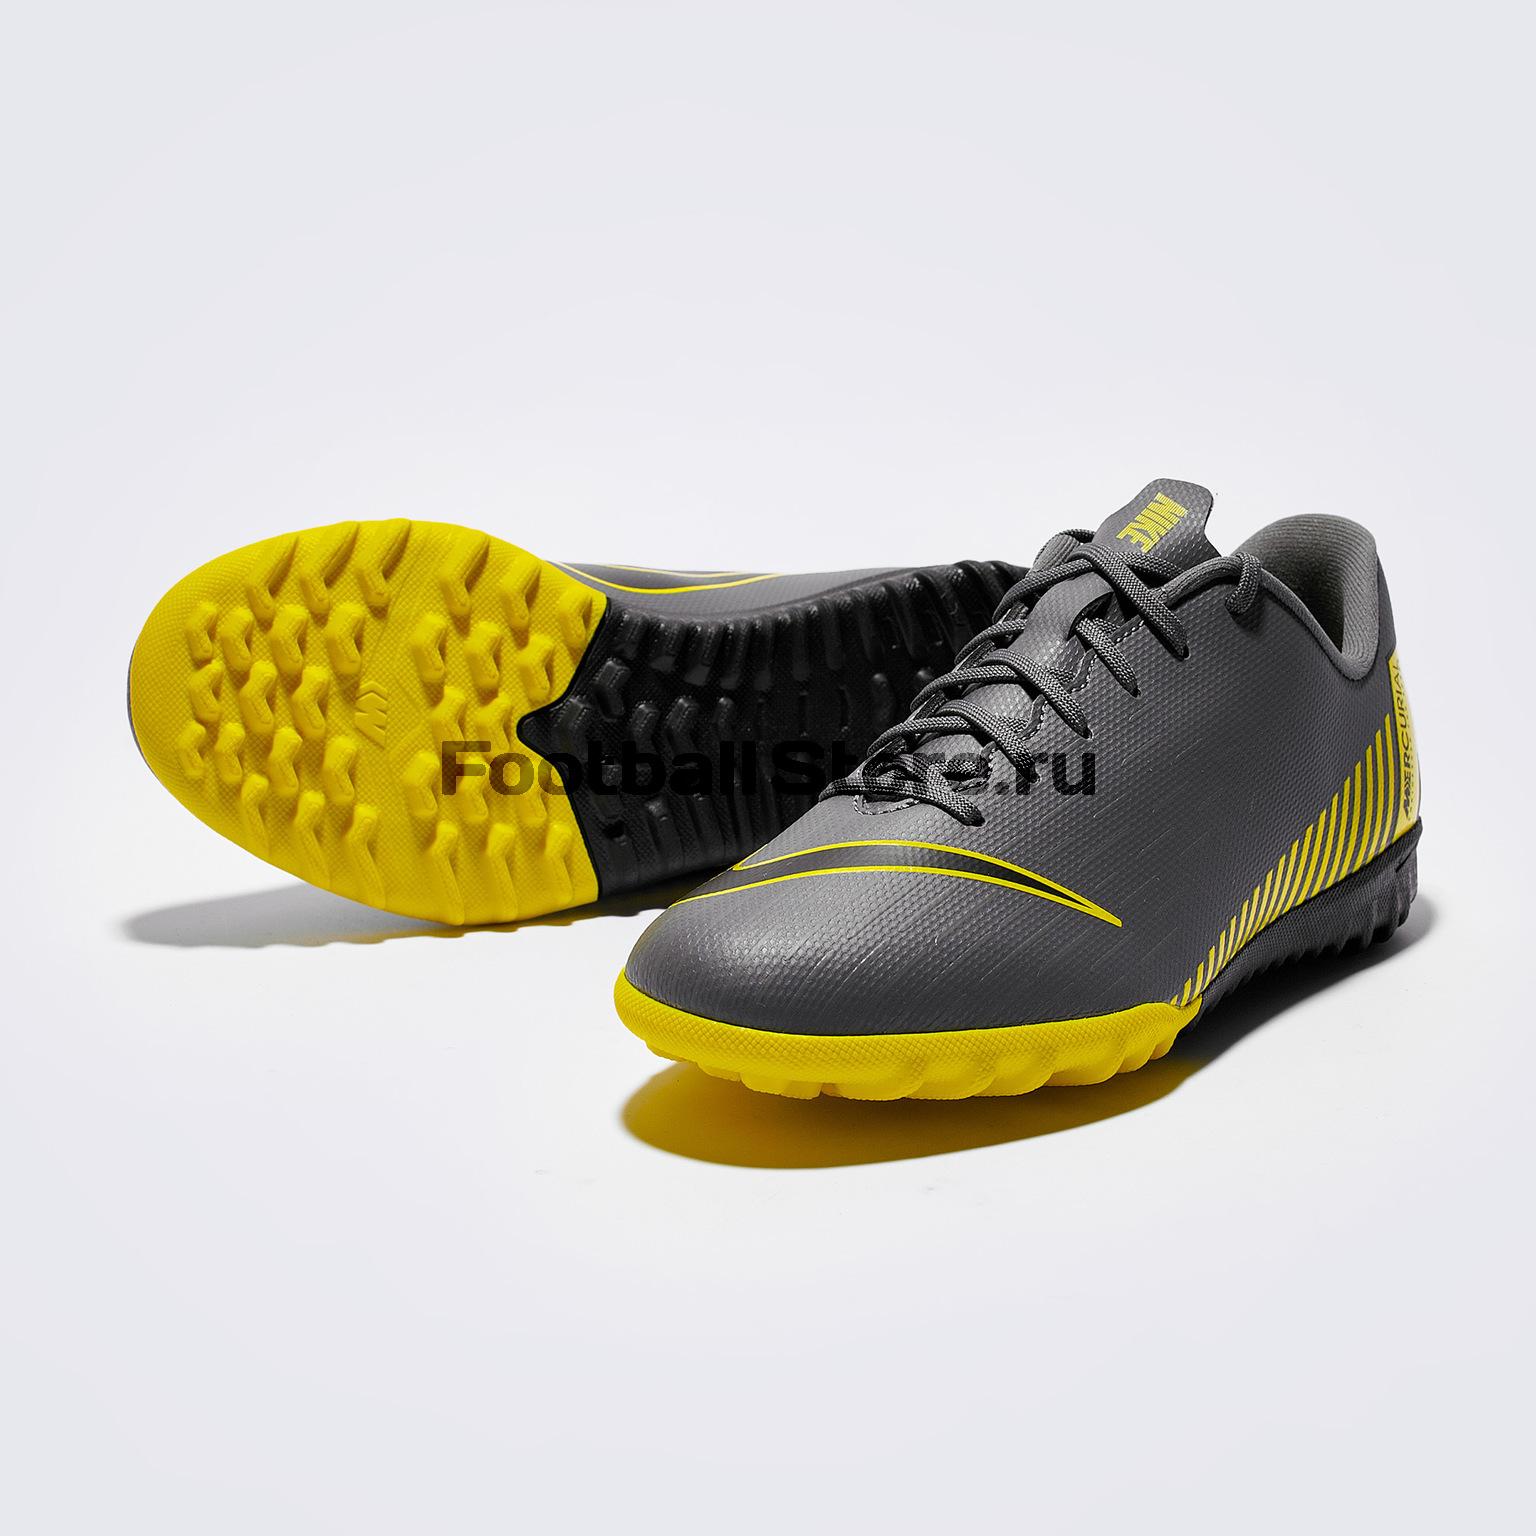 Шиповки детские Nike Vapor 12 Academy GS TF AH7342-070 шиповки nike elastico finale iii tf 685358 480 8 5 синий